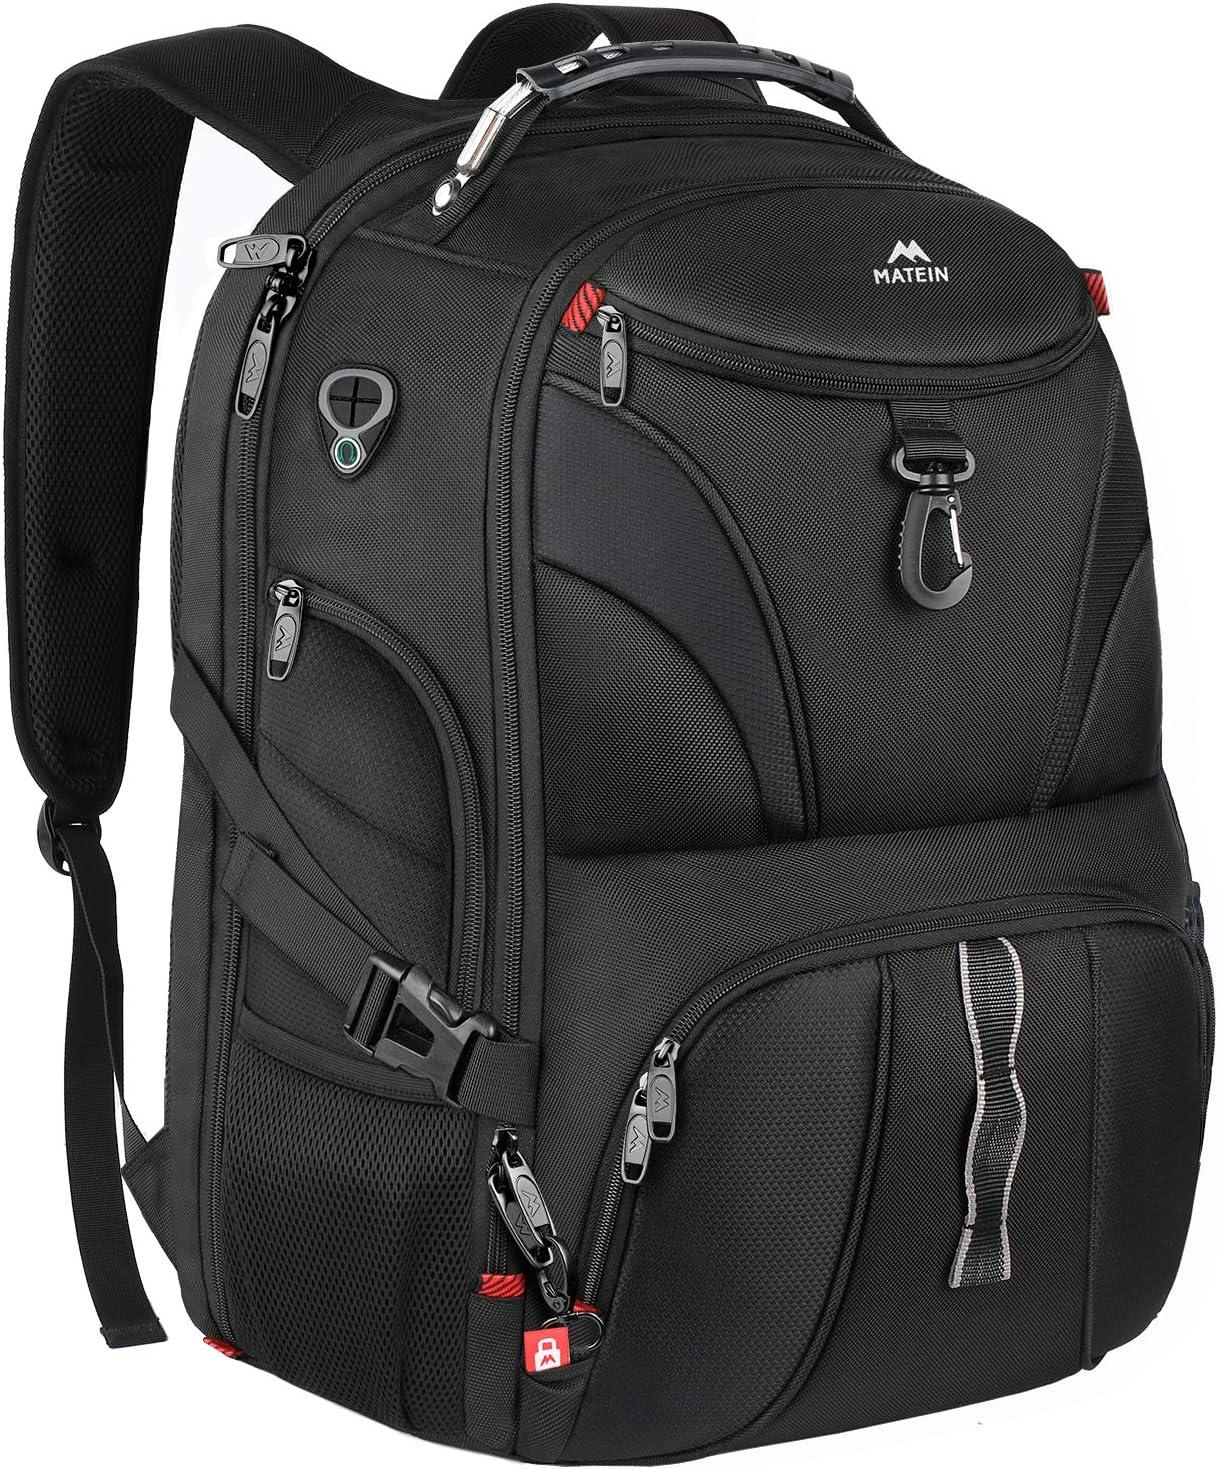 School Backpack, Matein Large Laptop Backpack for Men Women Student with USB Port, Big College Bookbag TSA Friendly Travel Bag Water Resistant Business Computer Backpacks Fit 17 Inch Laptops, Black